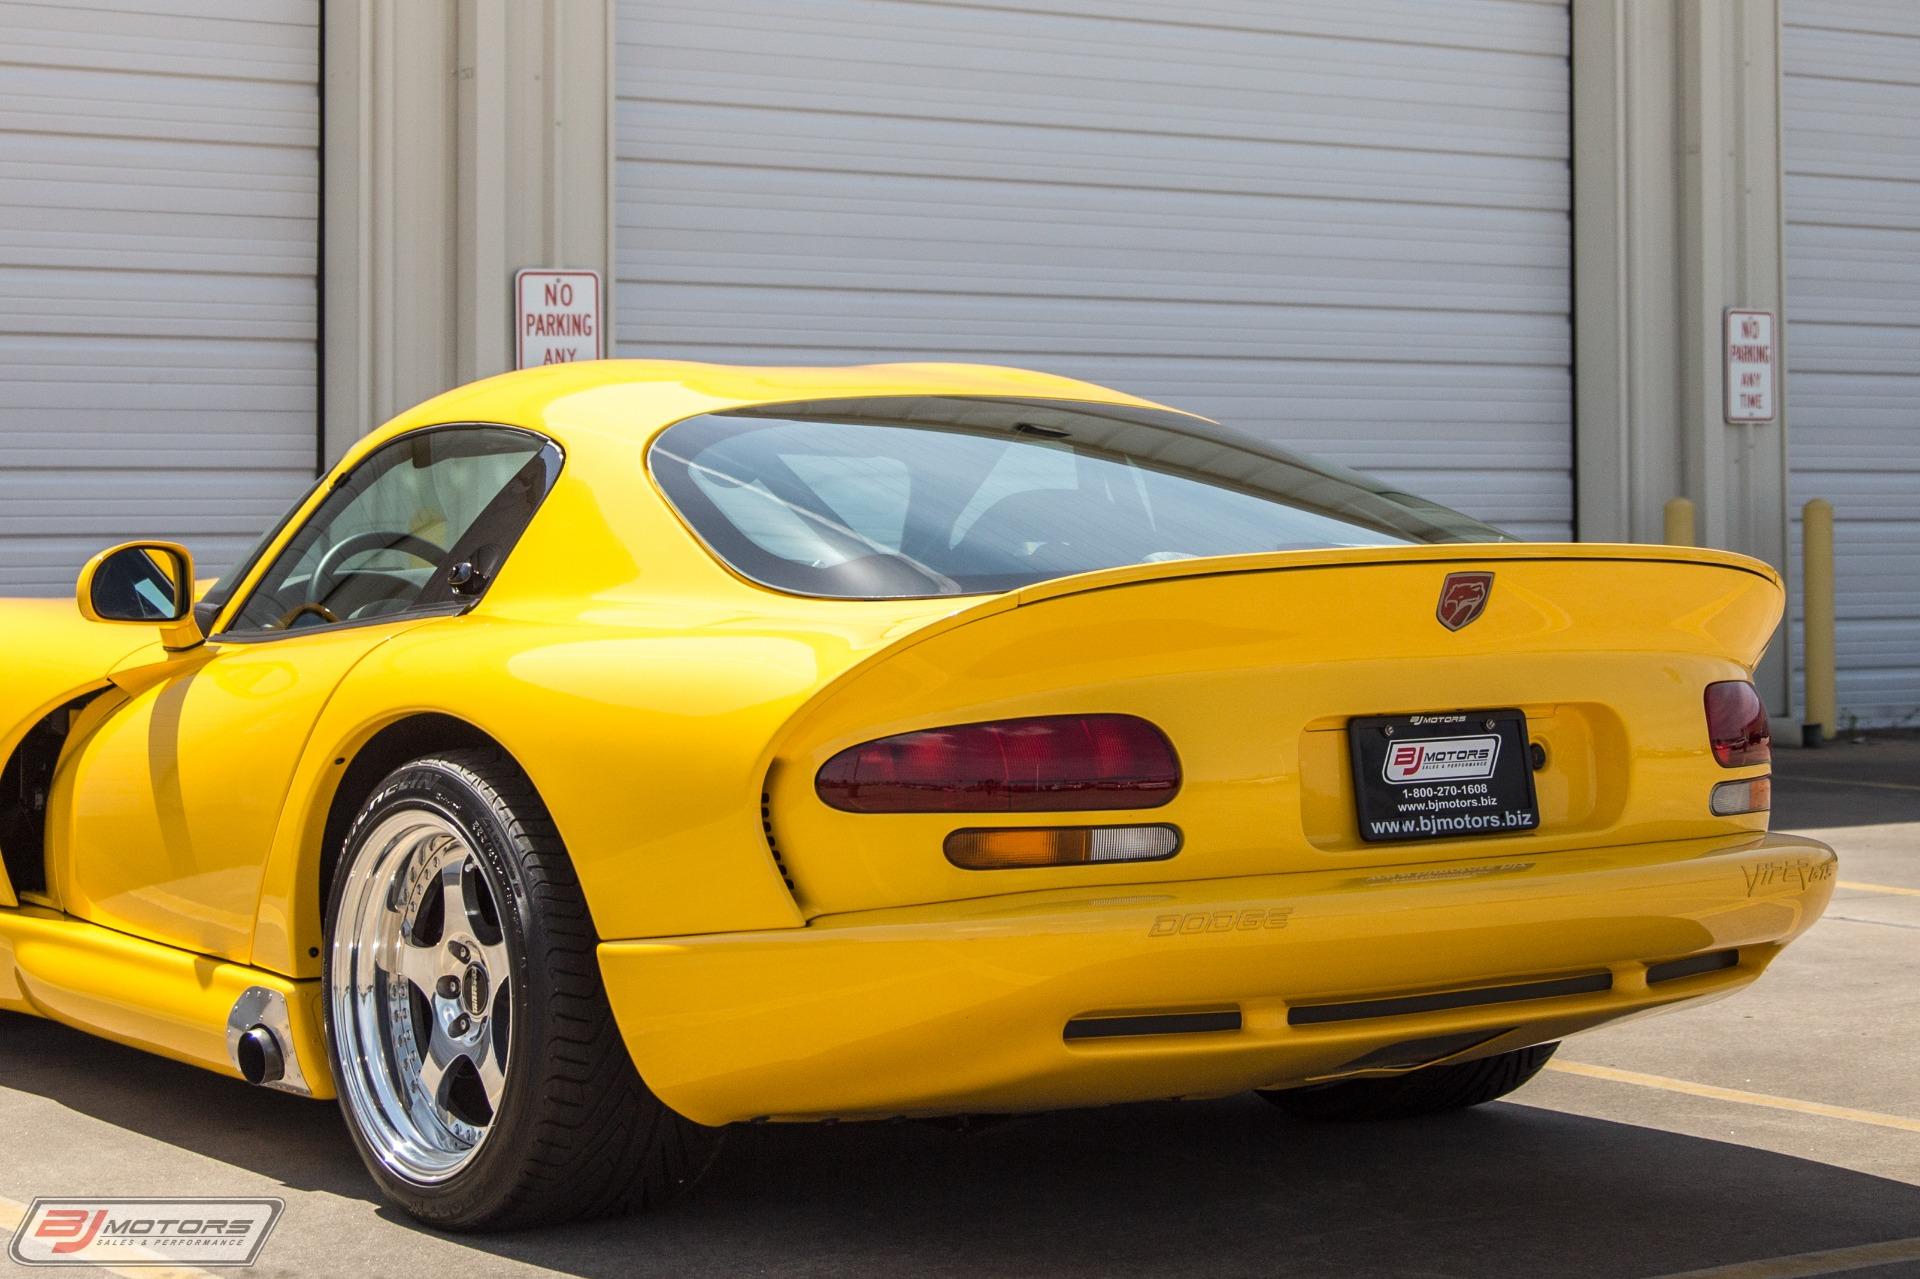 Used-2001-Dodge-Viper-GTS-600-Series